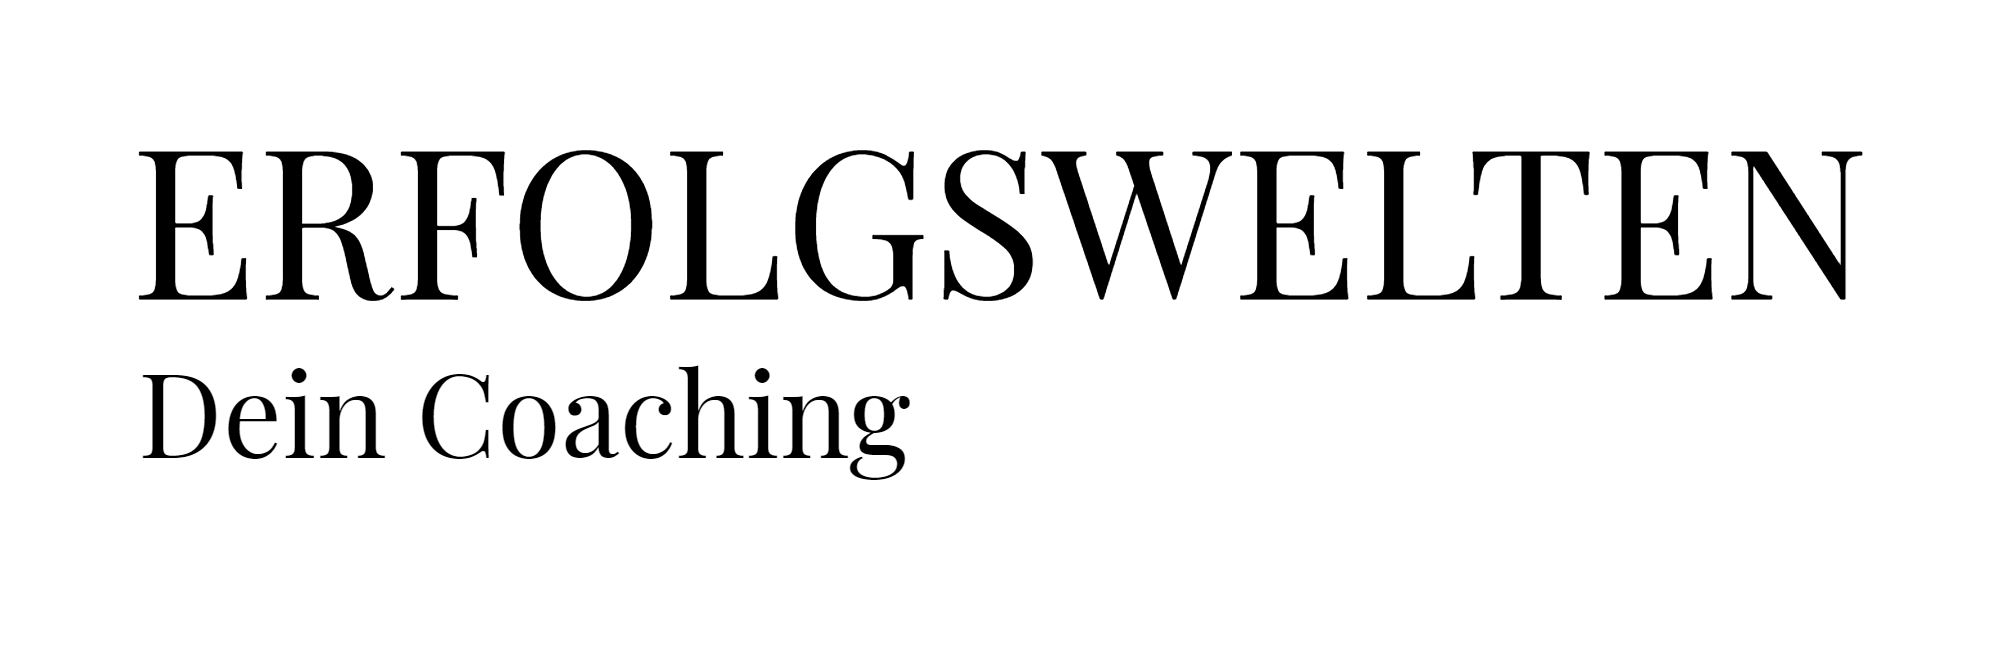 Mojomatix